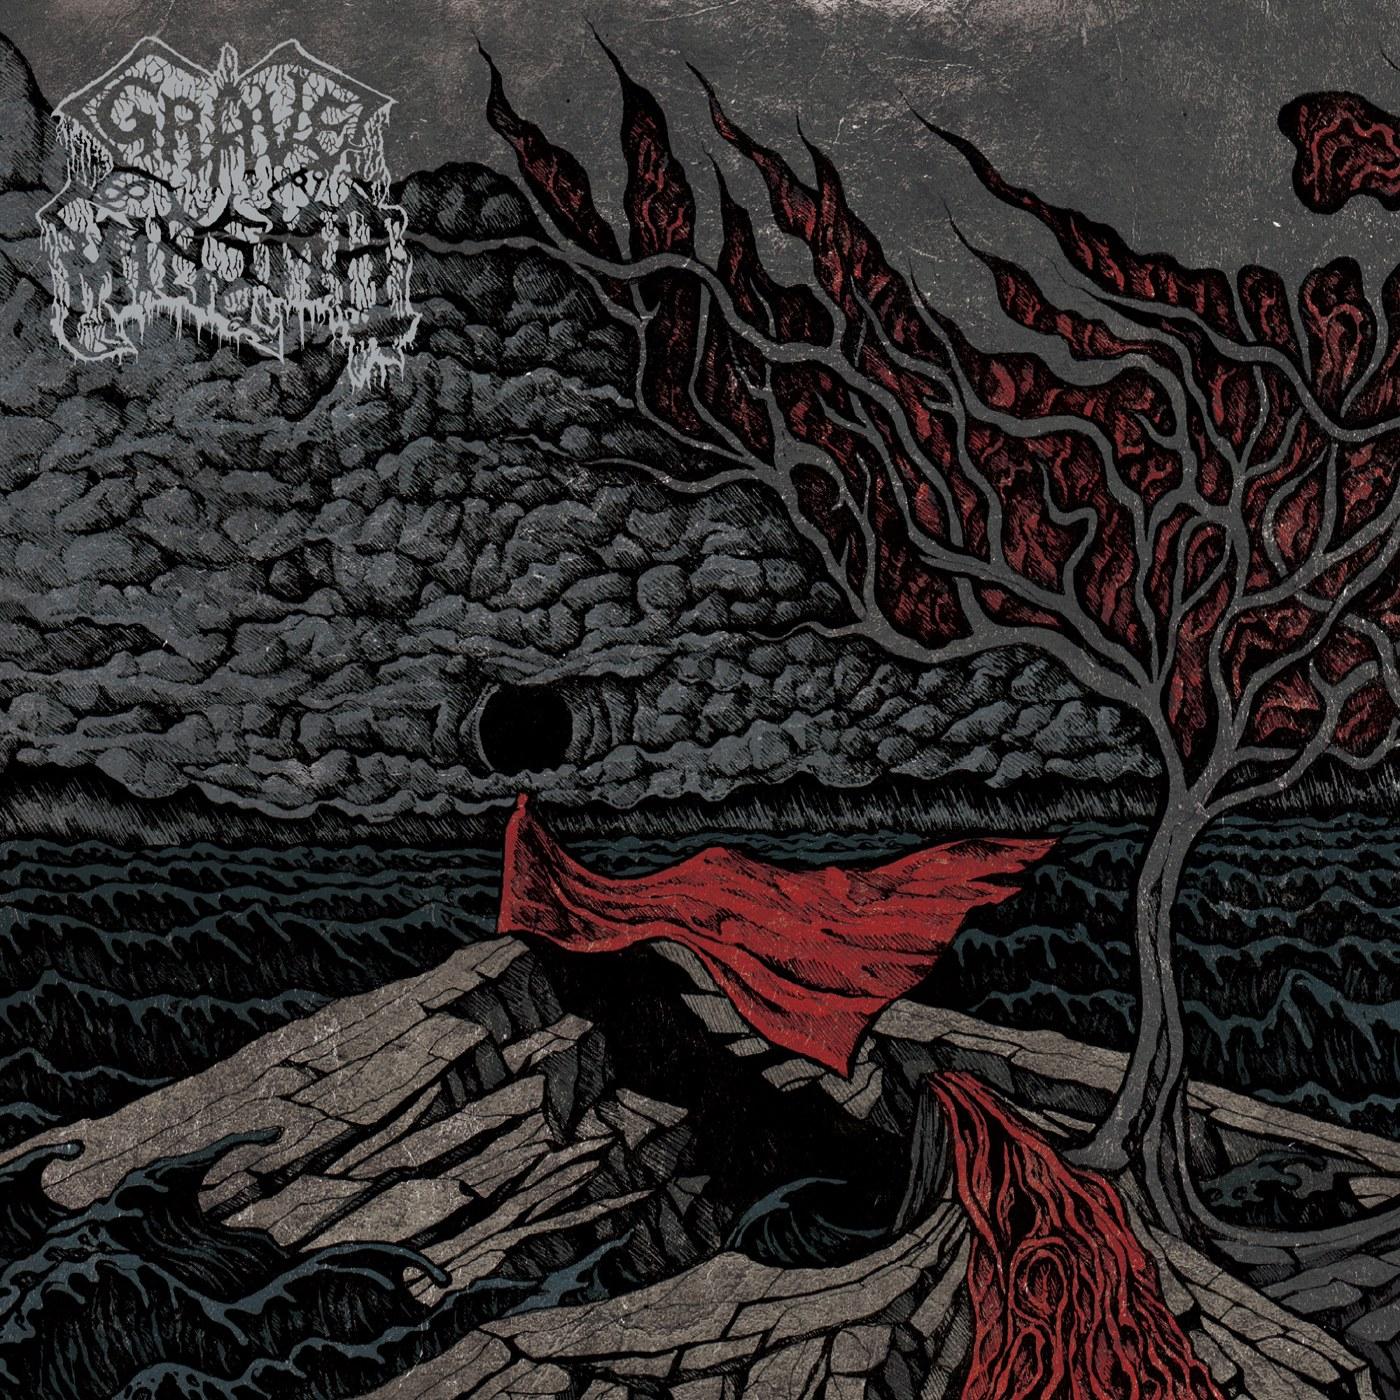 Reviews for Grave Miasma - Endless Pilgrimage